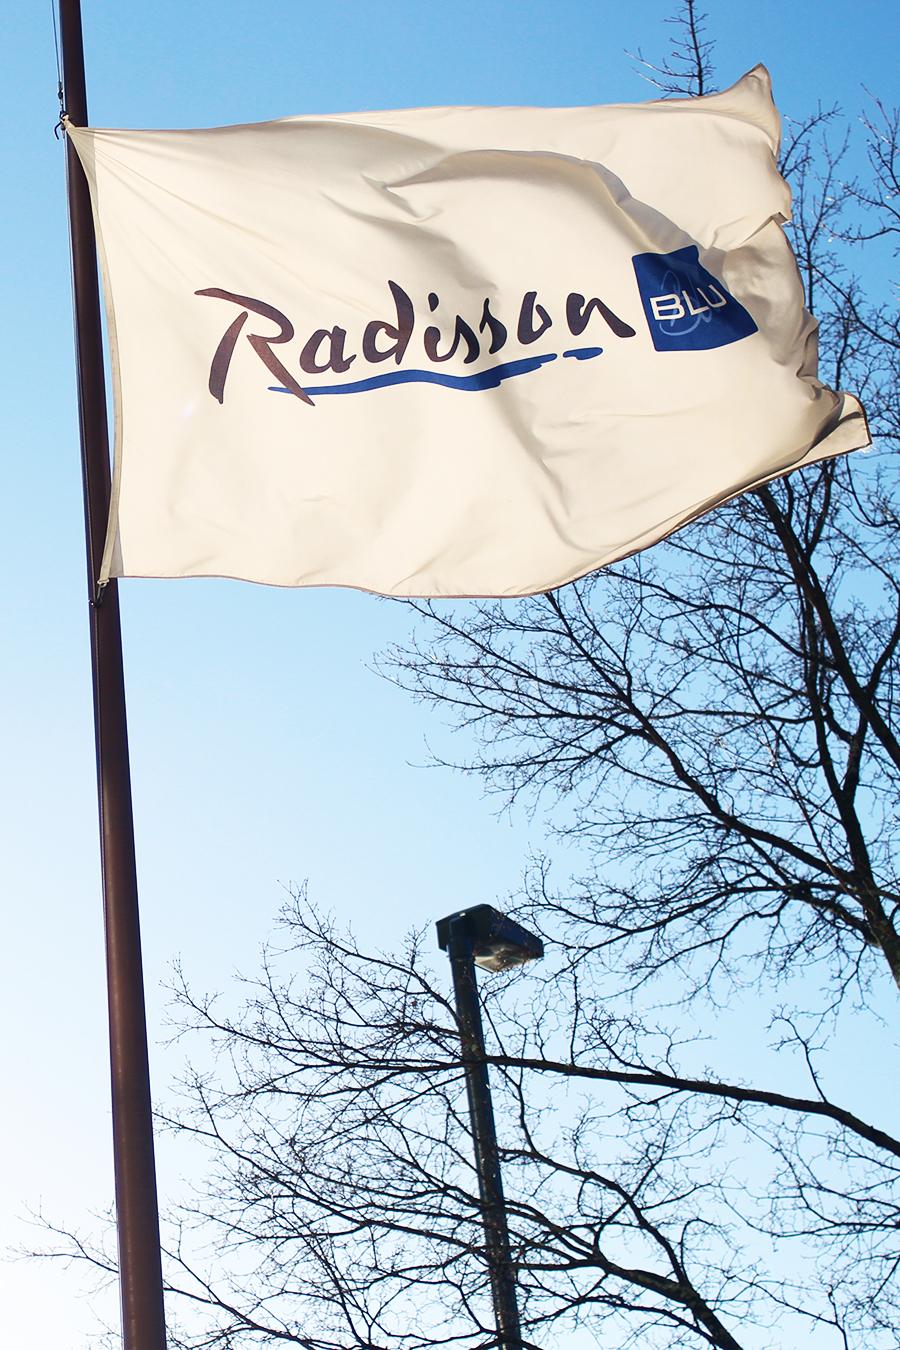 Radisson-Blu-Due-Fahne